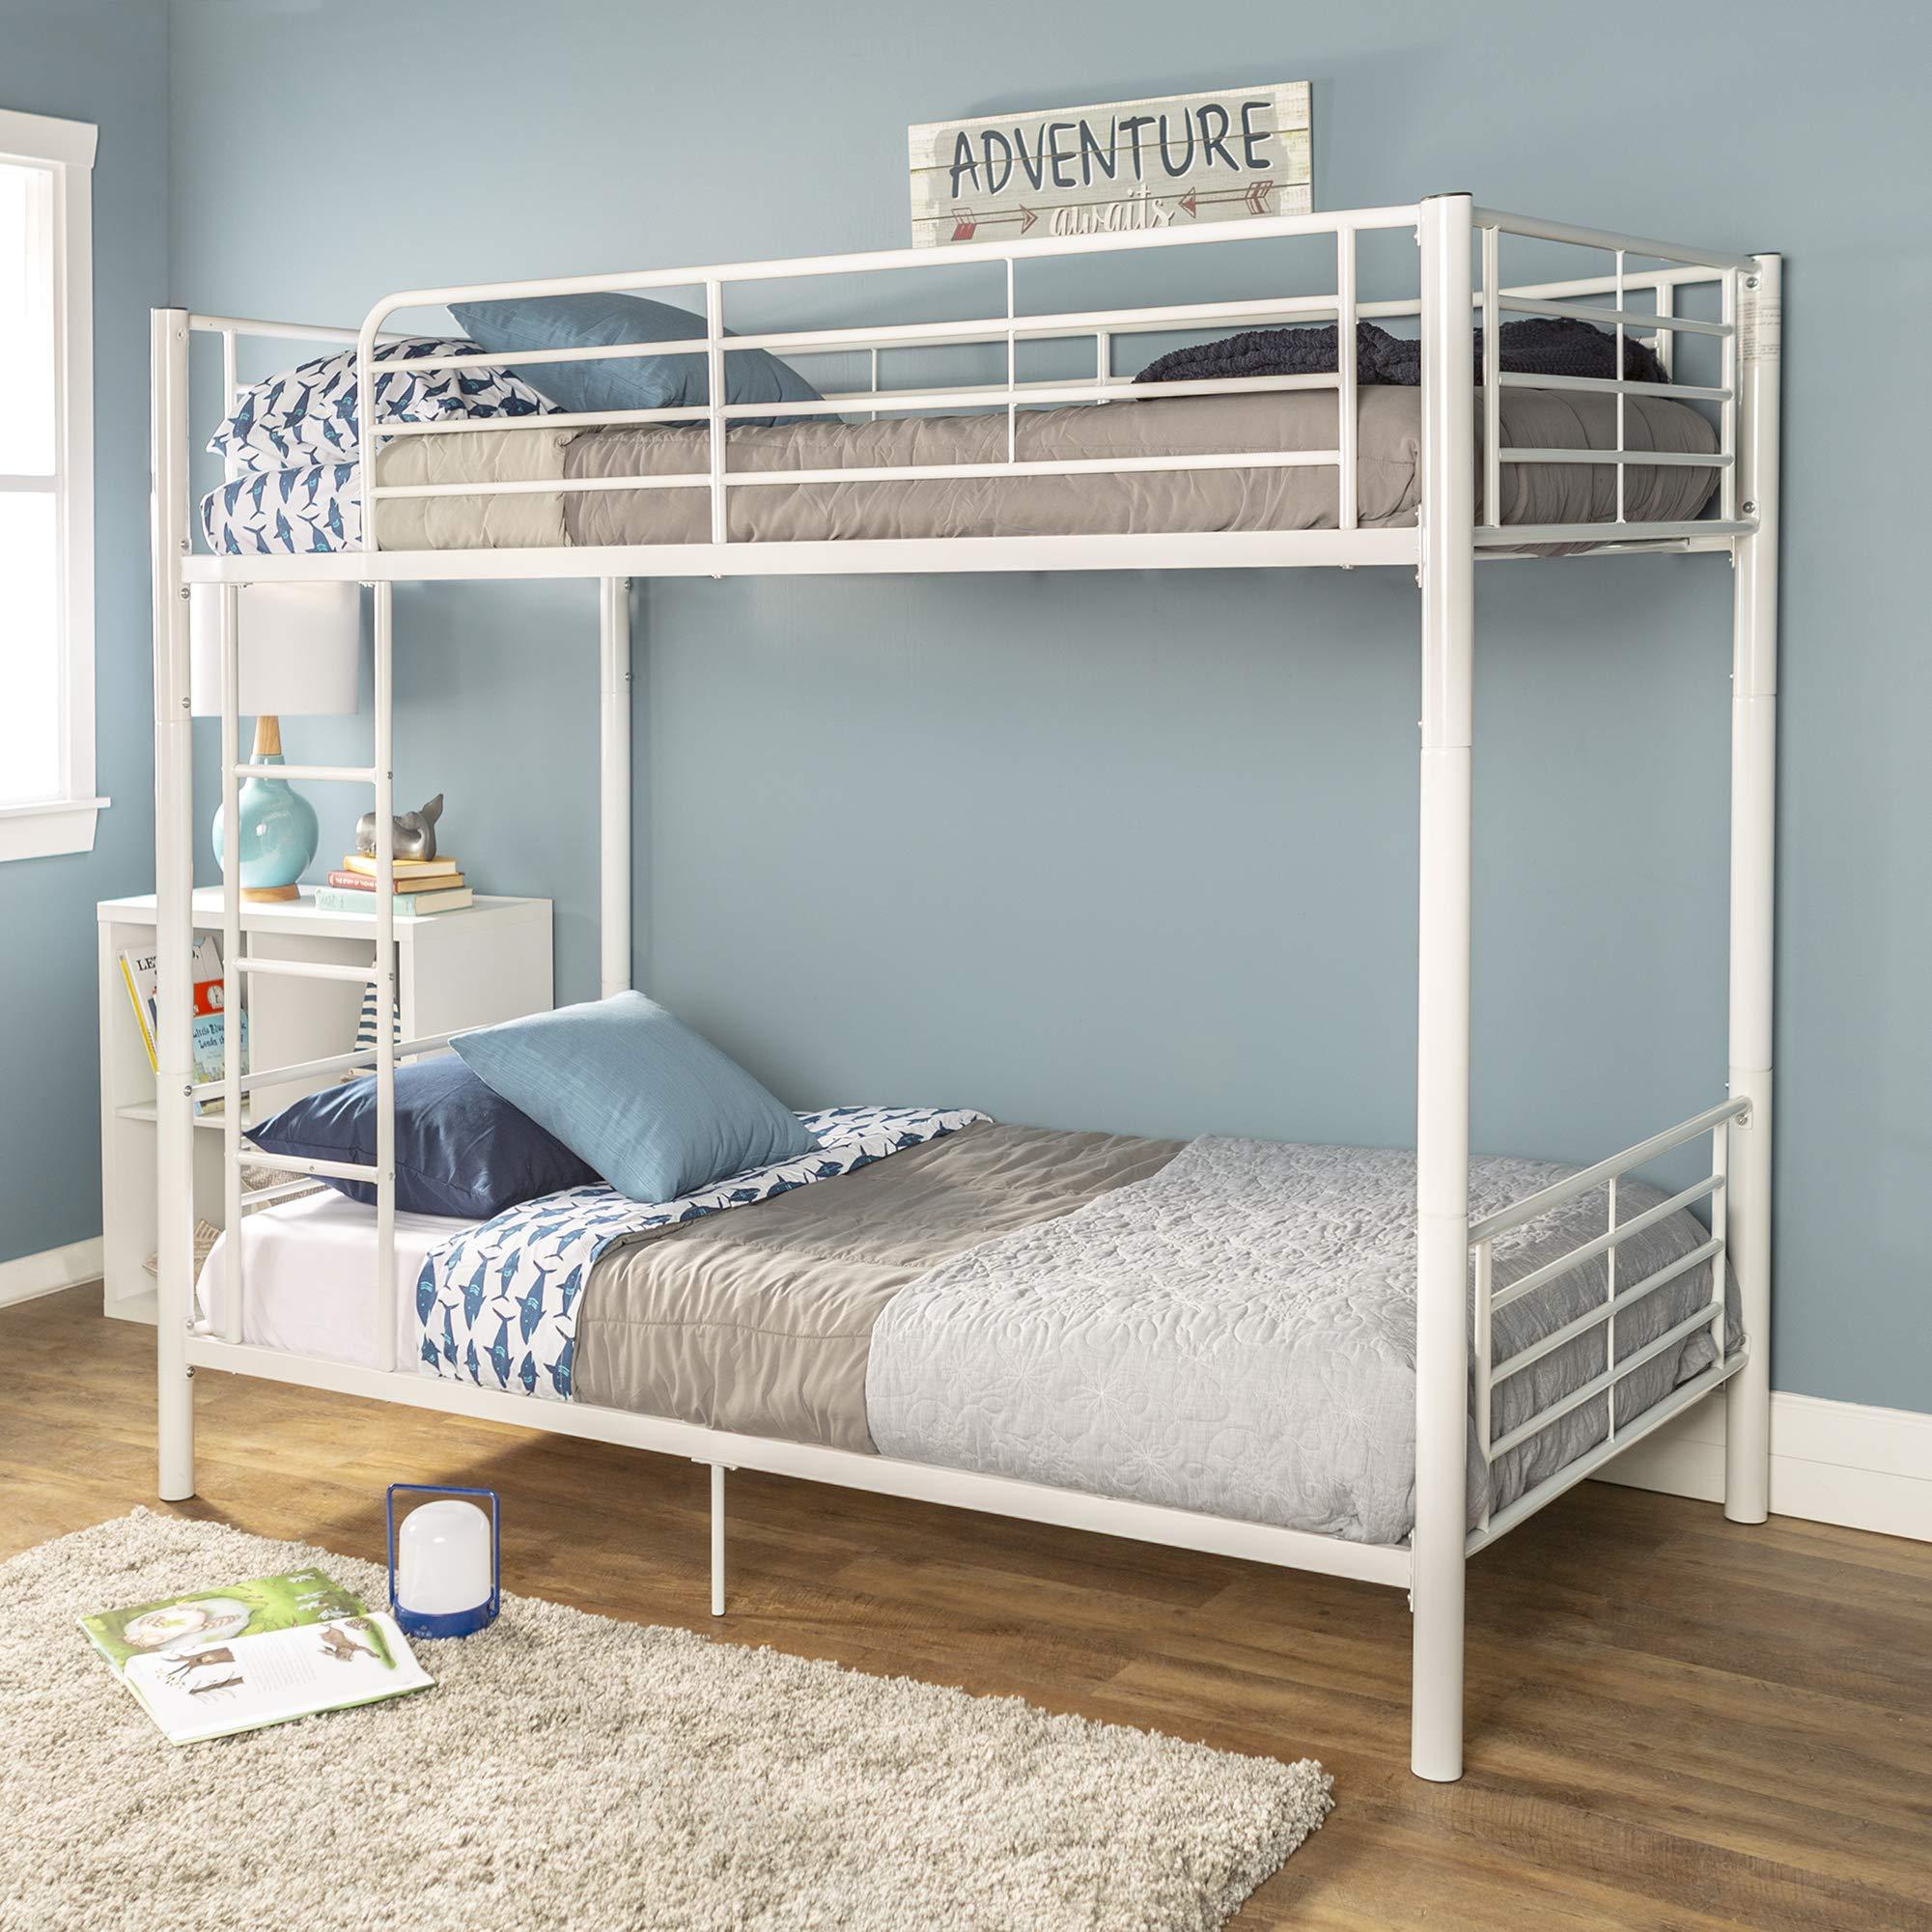 WE Furniture Modern Metal Pipe Twin Bunk Kids Bed Bedroom, White by WE Furniture